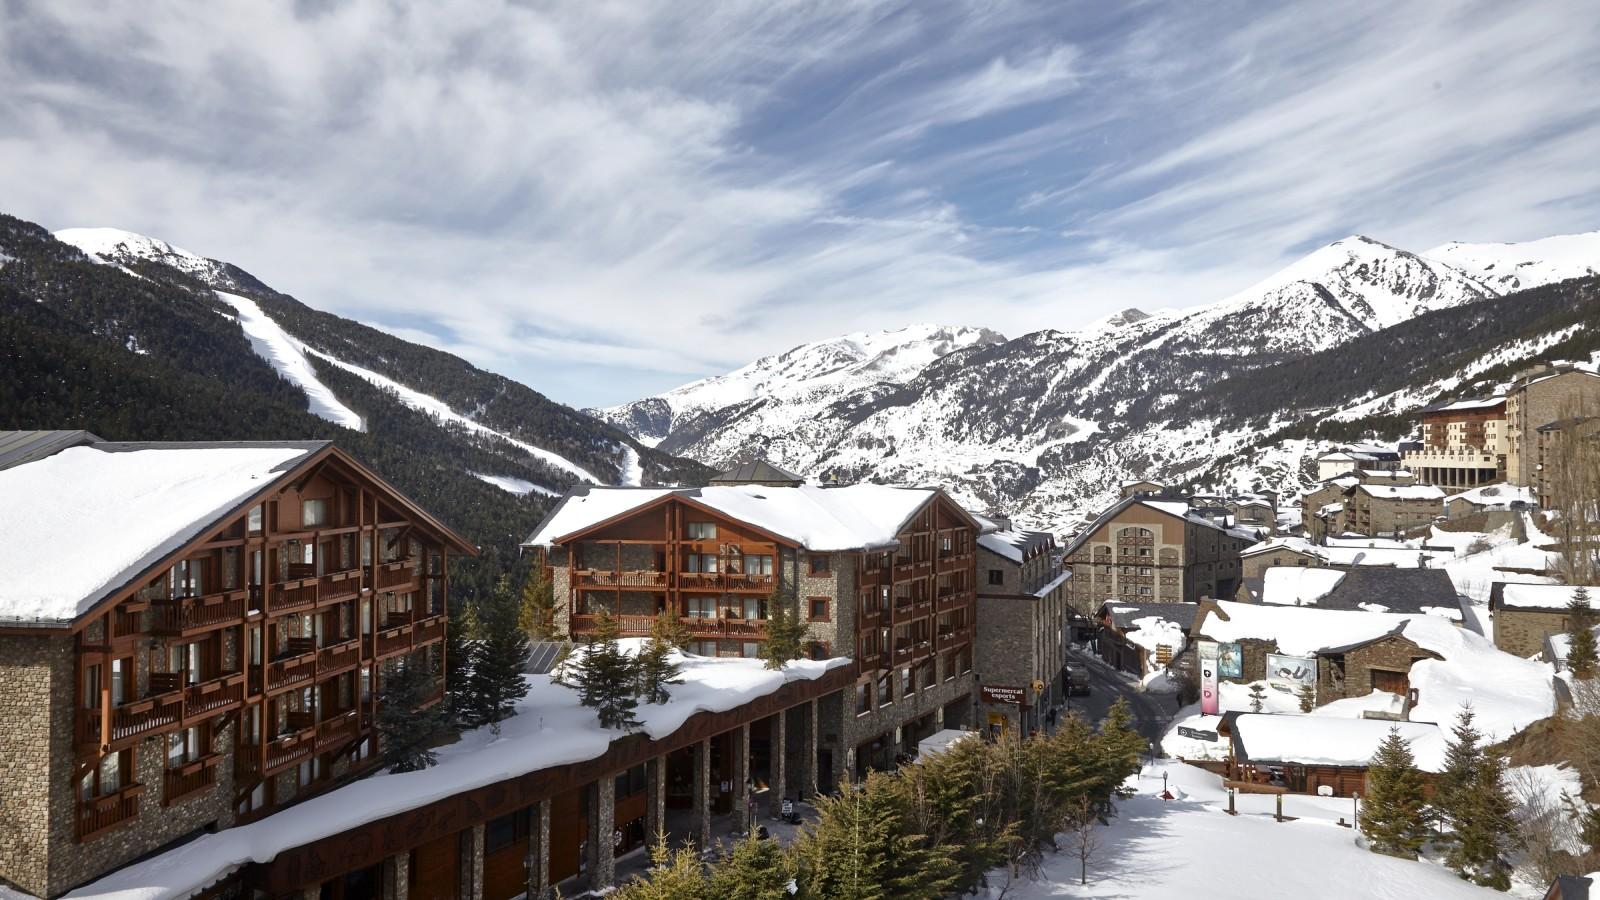 Soldeu Andorra  City pictures : Ski Andorra Soldeu & El Tarter Sport Hotel Village Ski Holidays ...